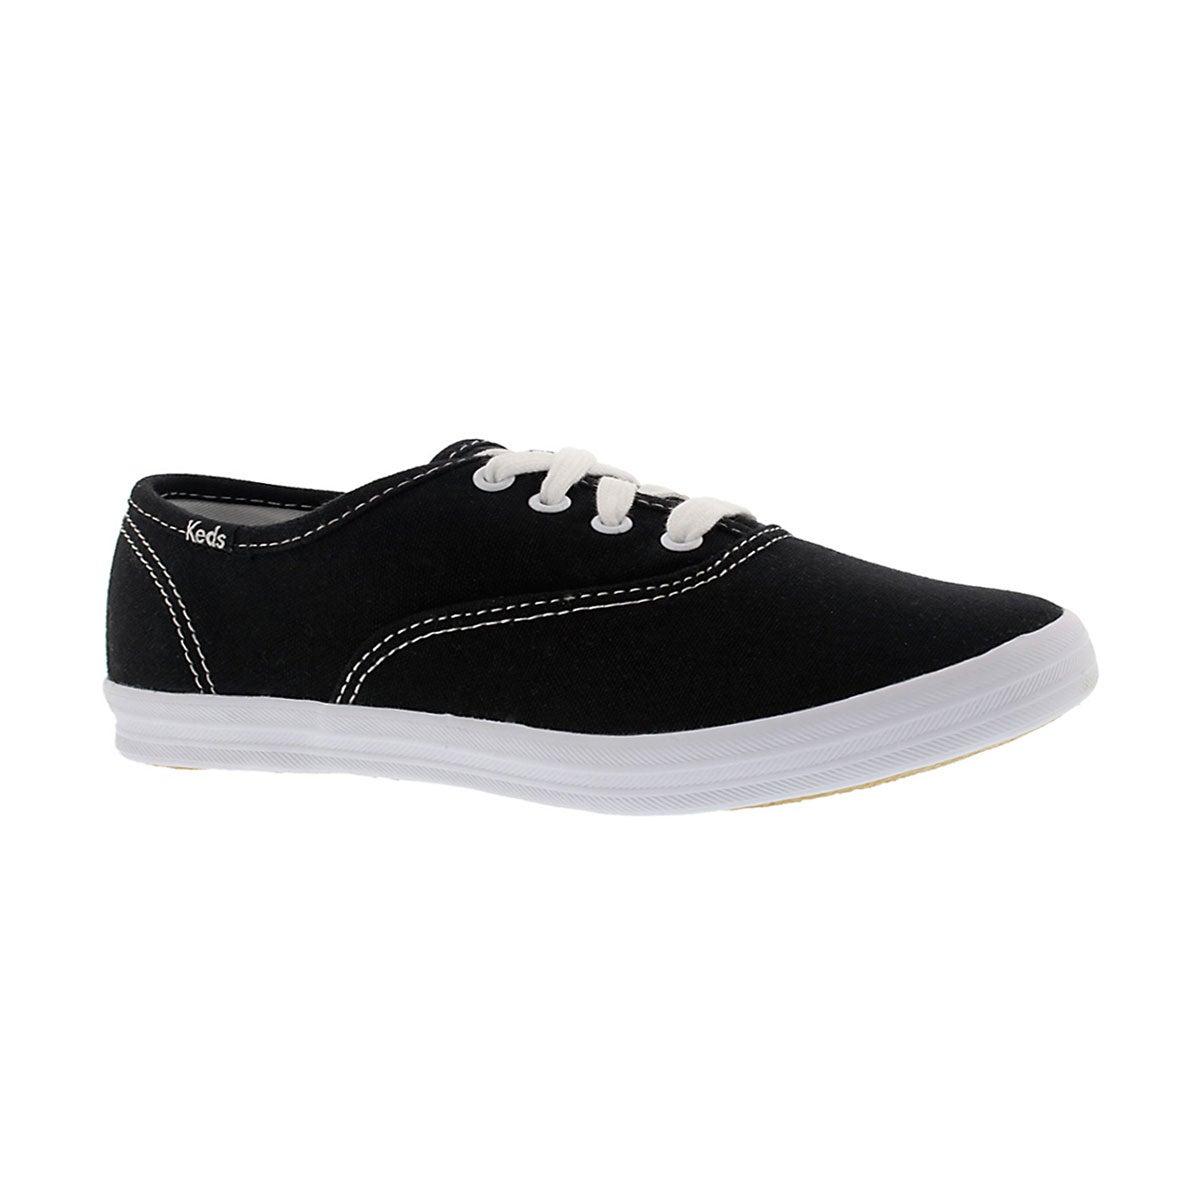 Grls Champion CVO blk/wht canvas sneaker